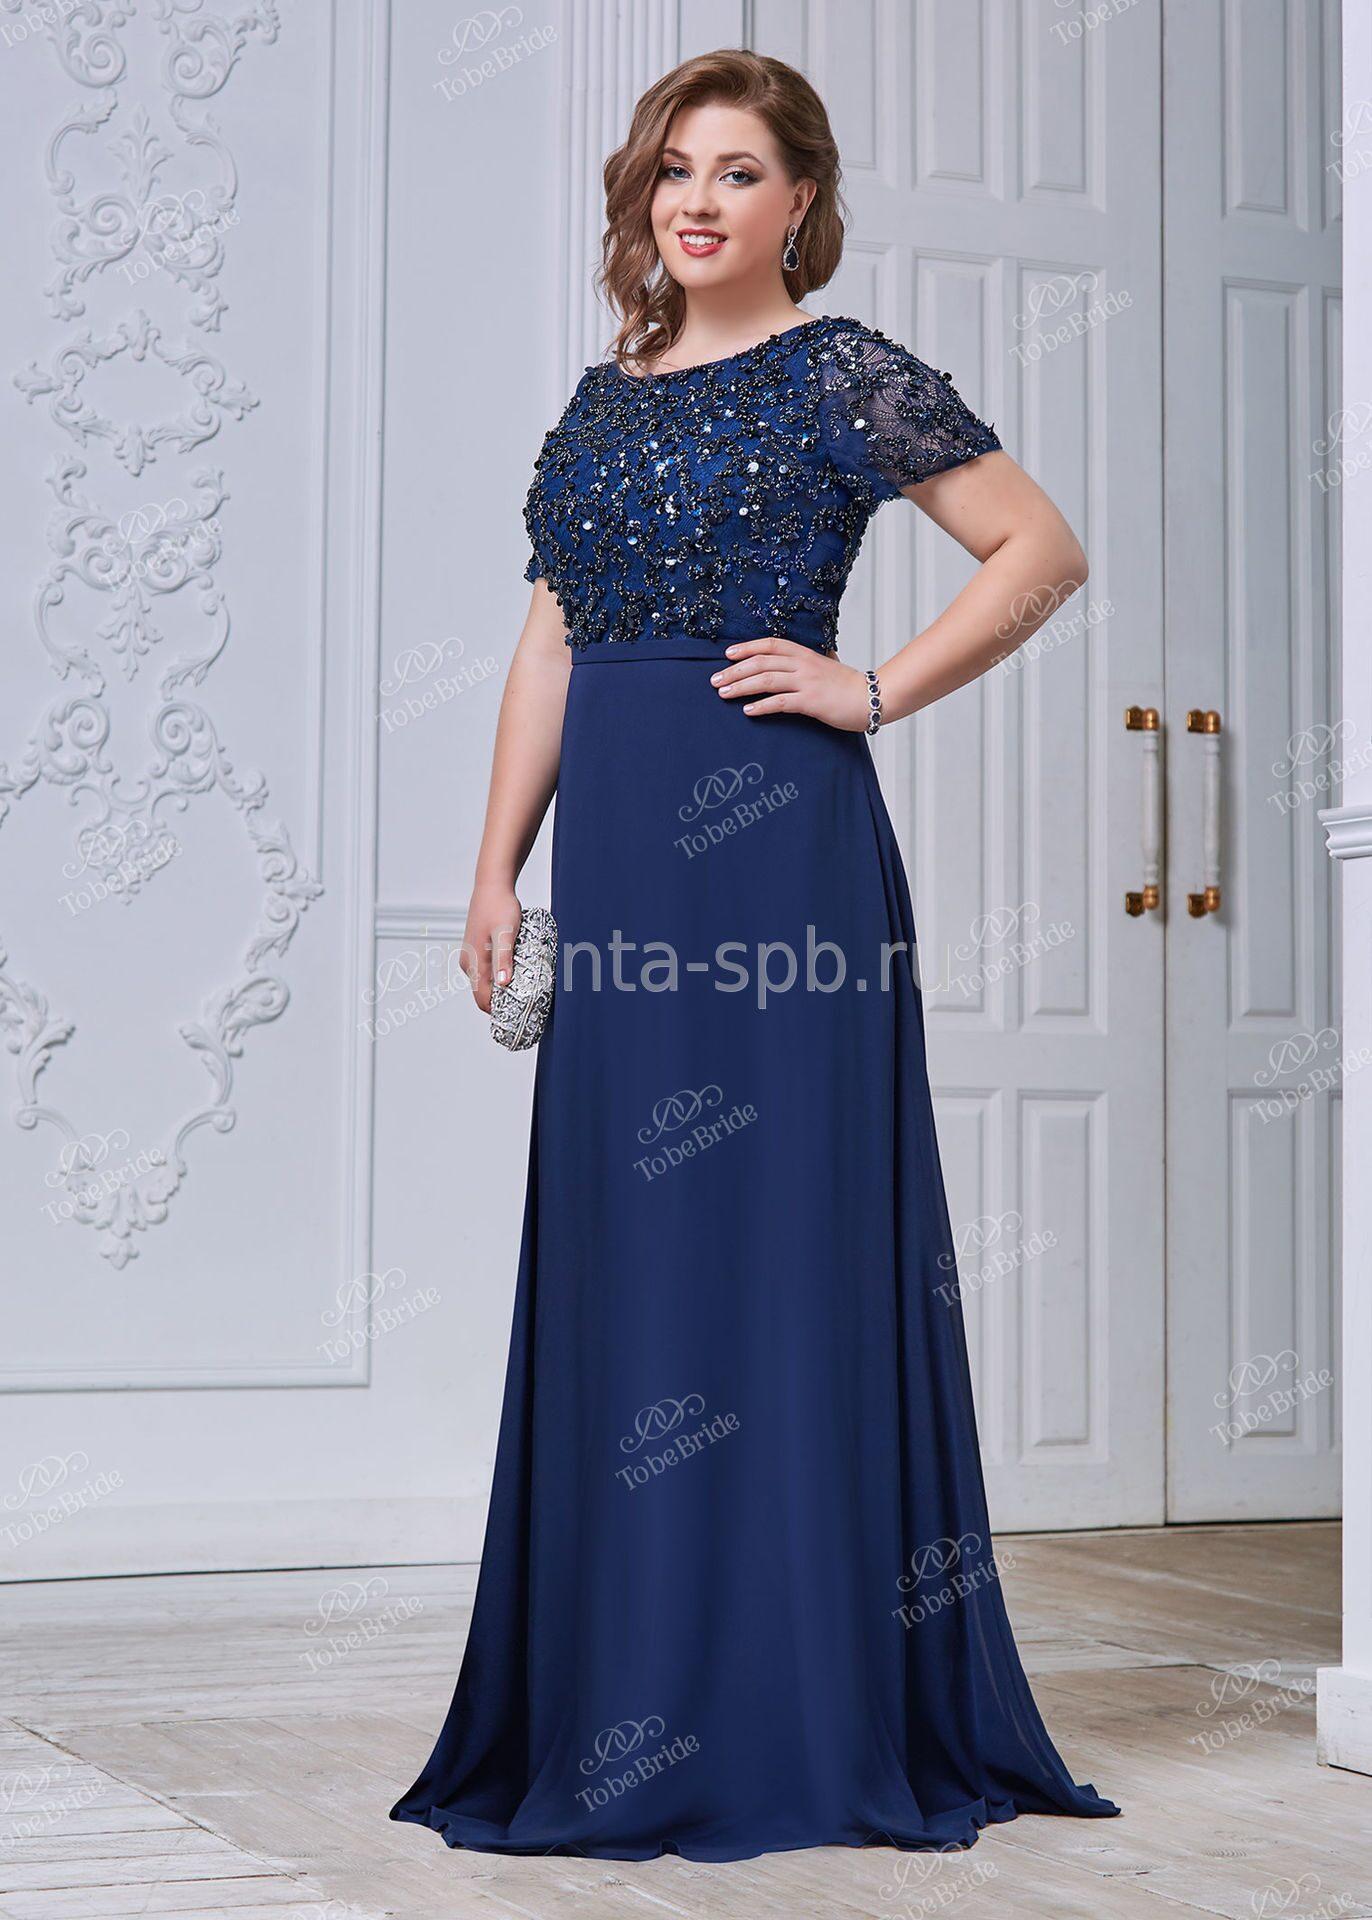 Платья вечерние фото 50 размера